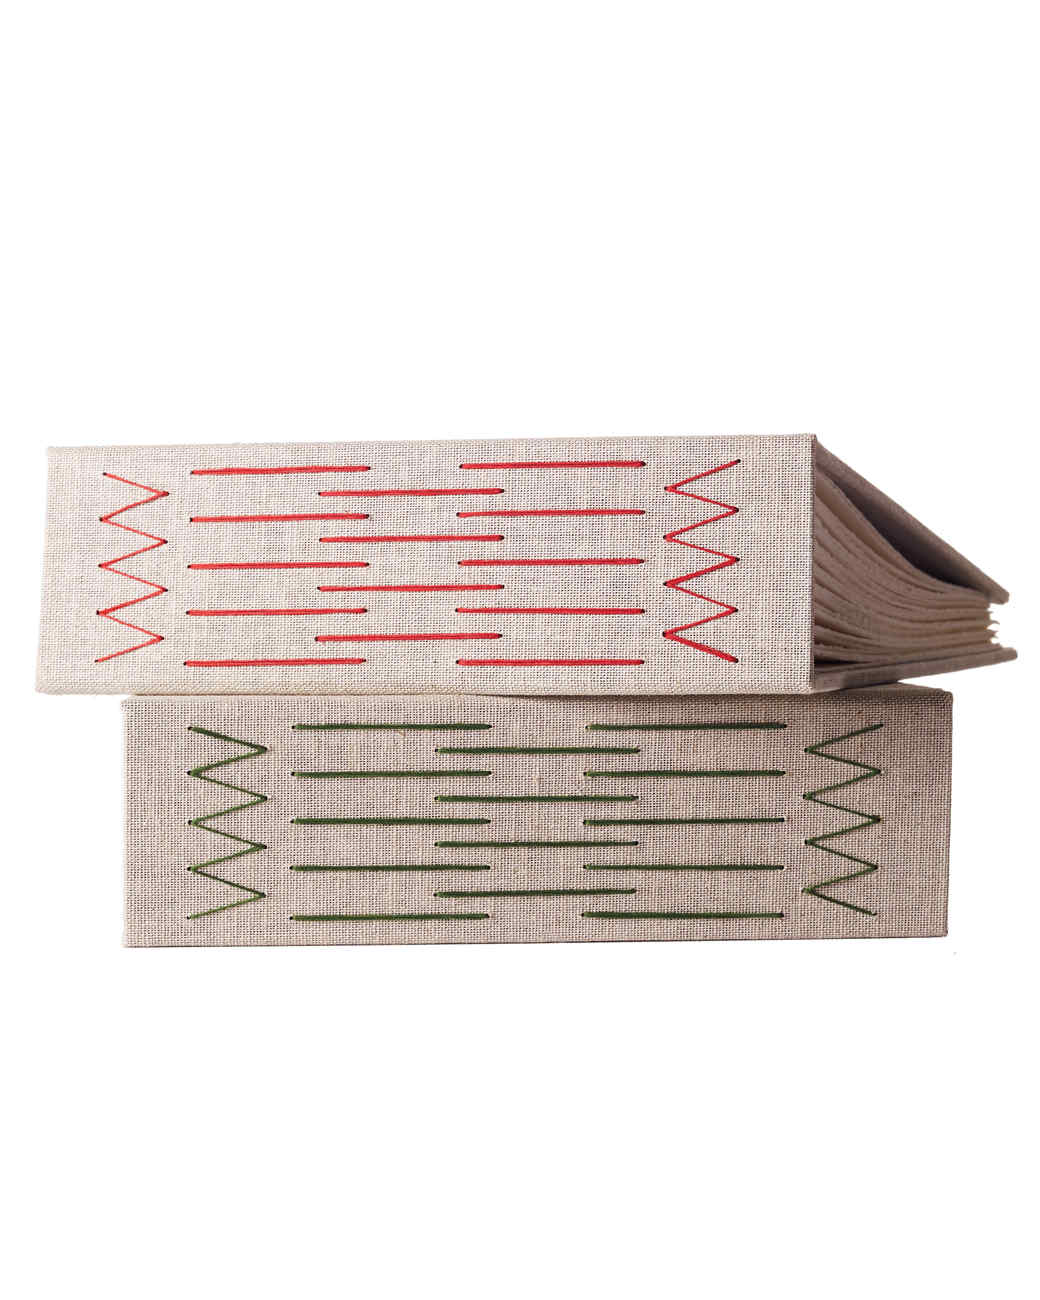 stitched-notebooks-001-d111535.jpg